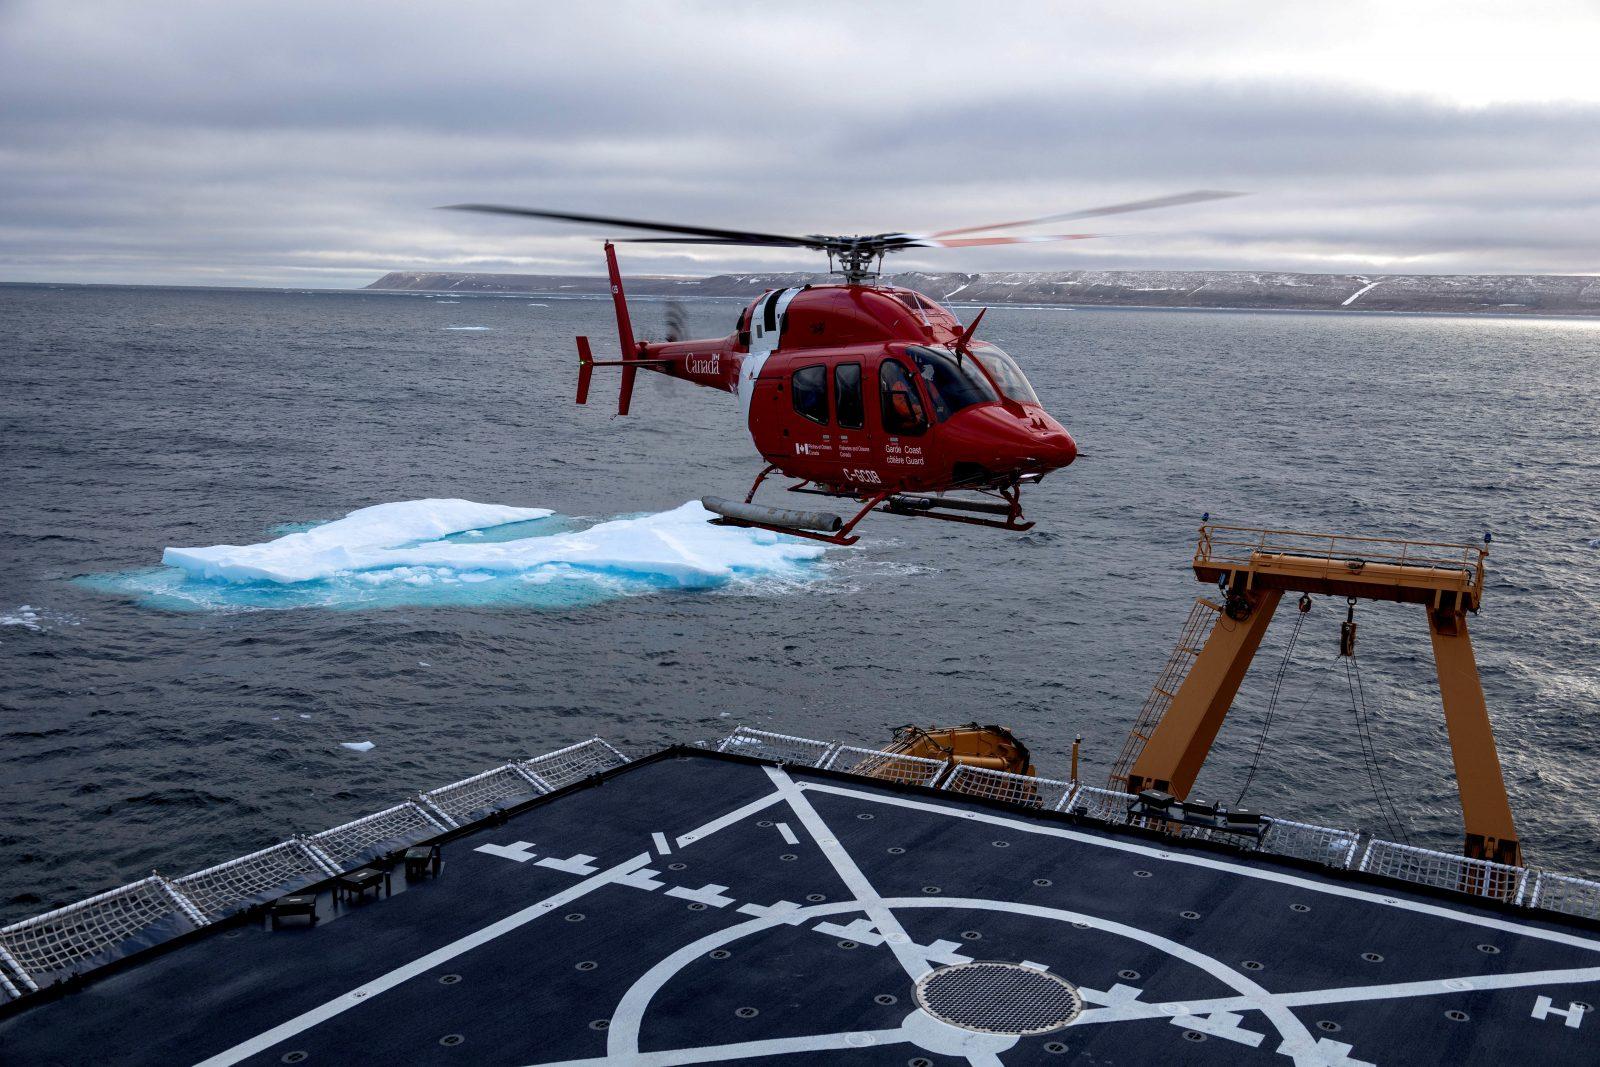 A Canadian coast guard helicopter lands aboard the U.S. Coast Guard Cutter Healy near Resolute, Nunavut, Canada on Sept. 6, 2021.